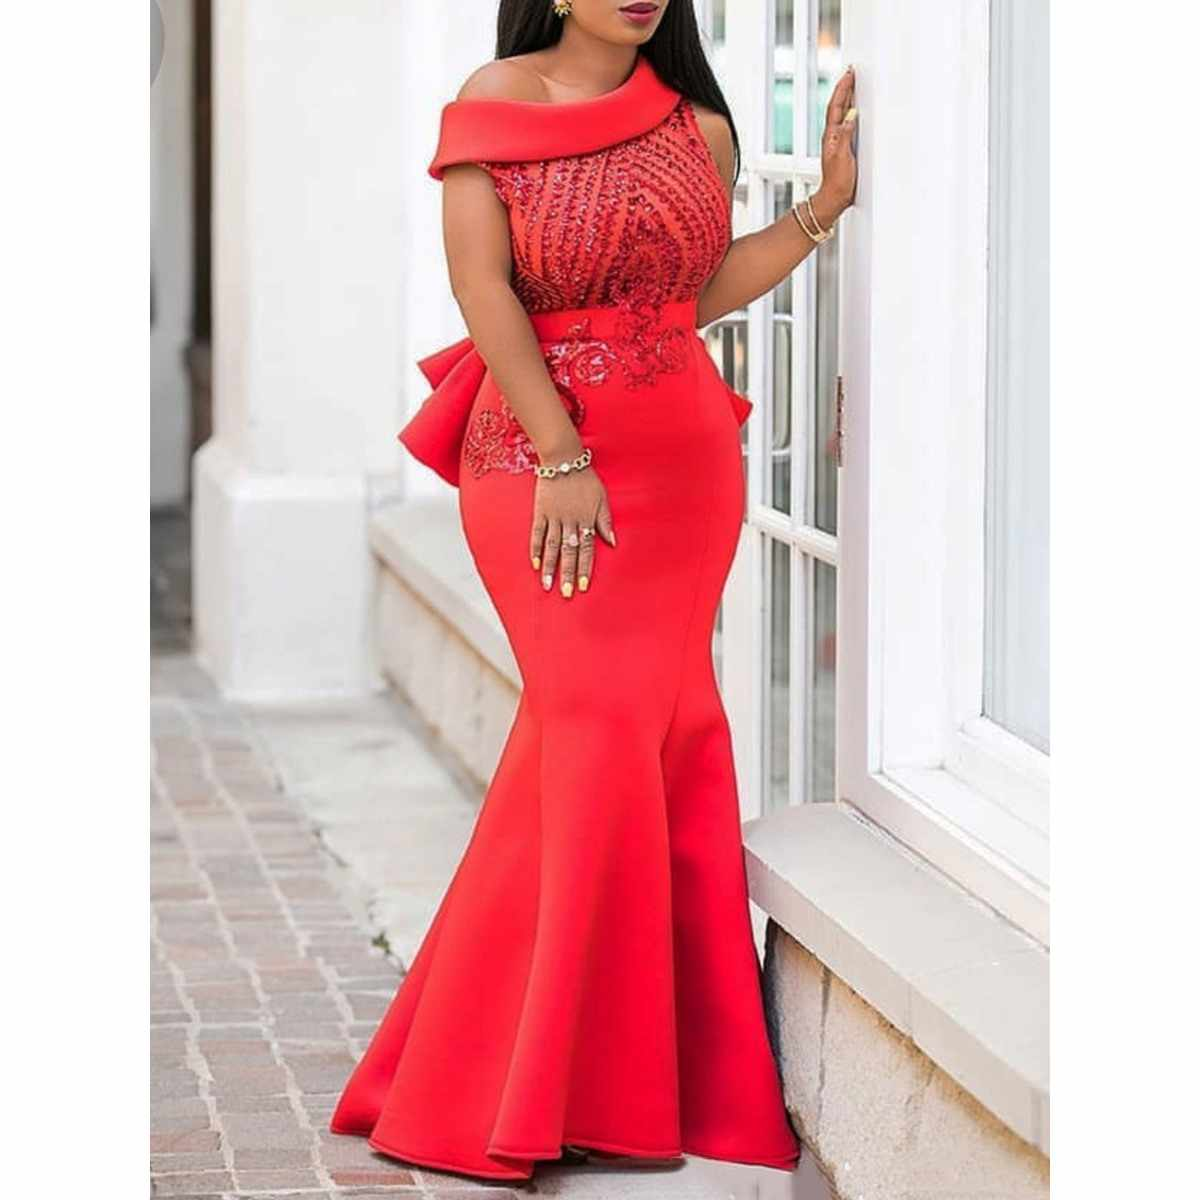 eb1205d939 Detail Feedback Questions about Women Maxi Dresses Plus Size trumpet ...